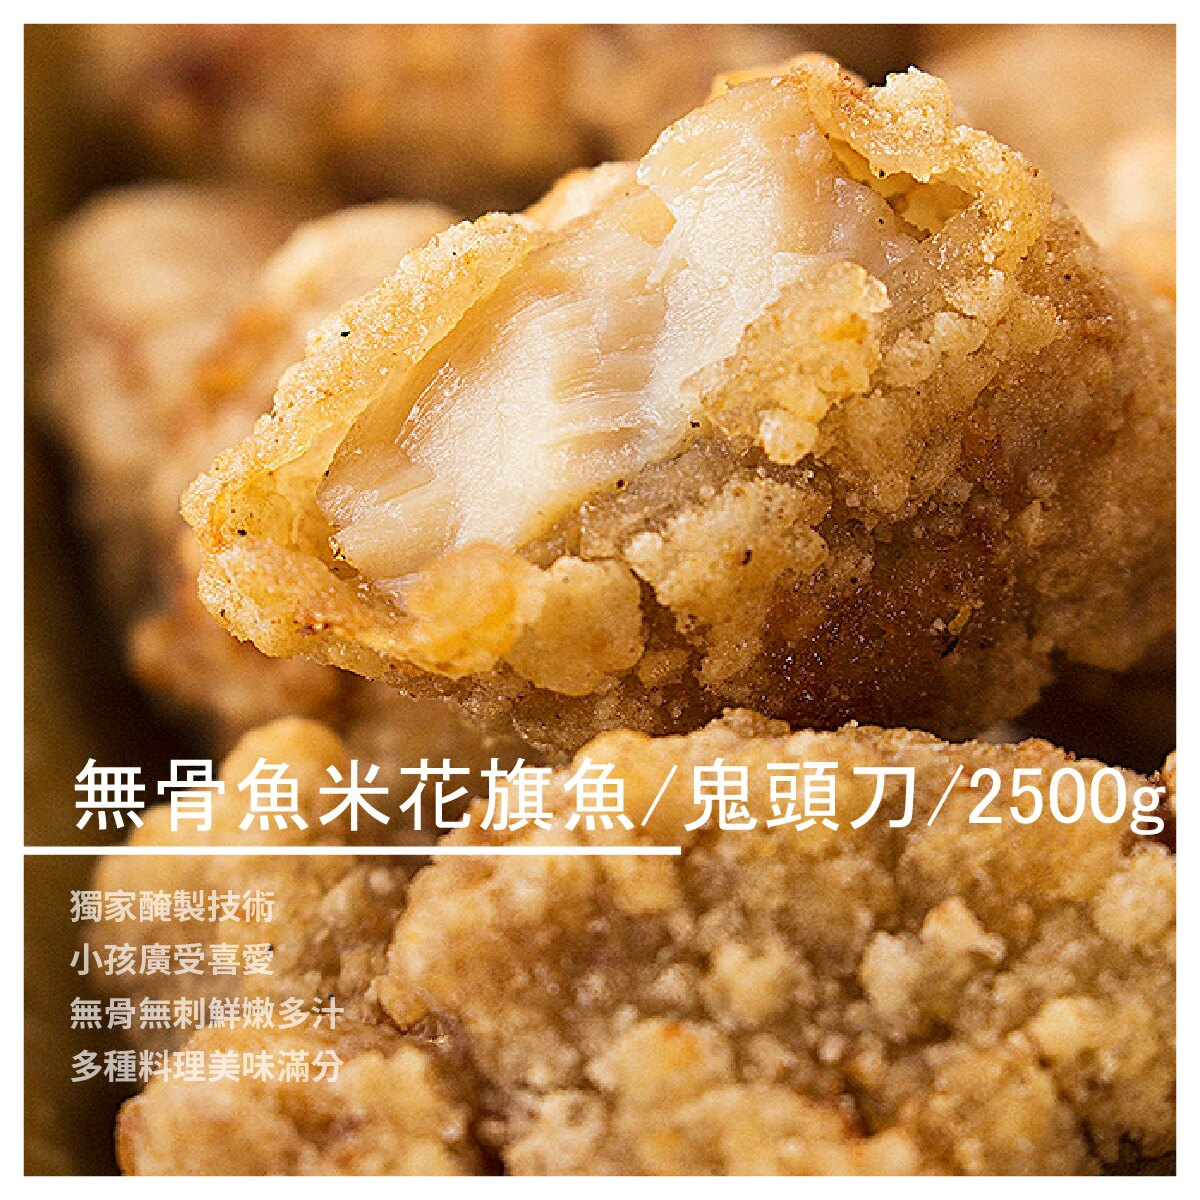 【PP Fish 魚米花】無骨魚米花(旗魚/鬼頭刀)/2500g(500g*5包)/兩款口味